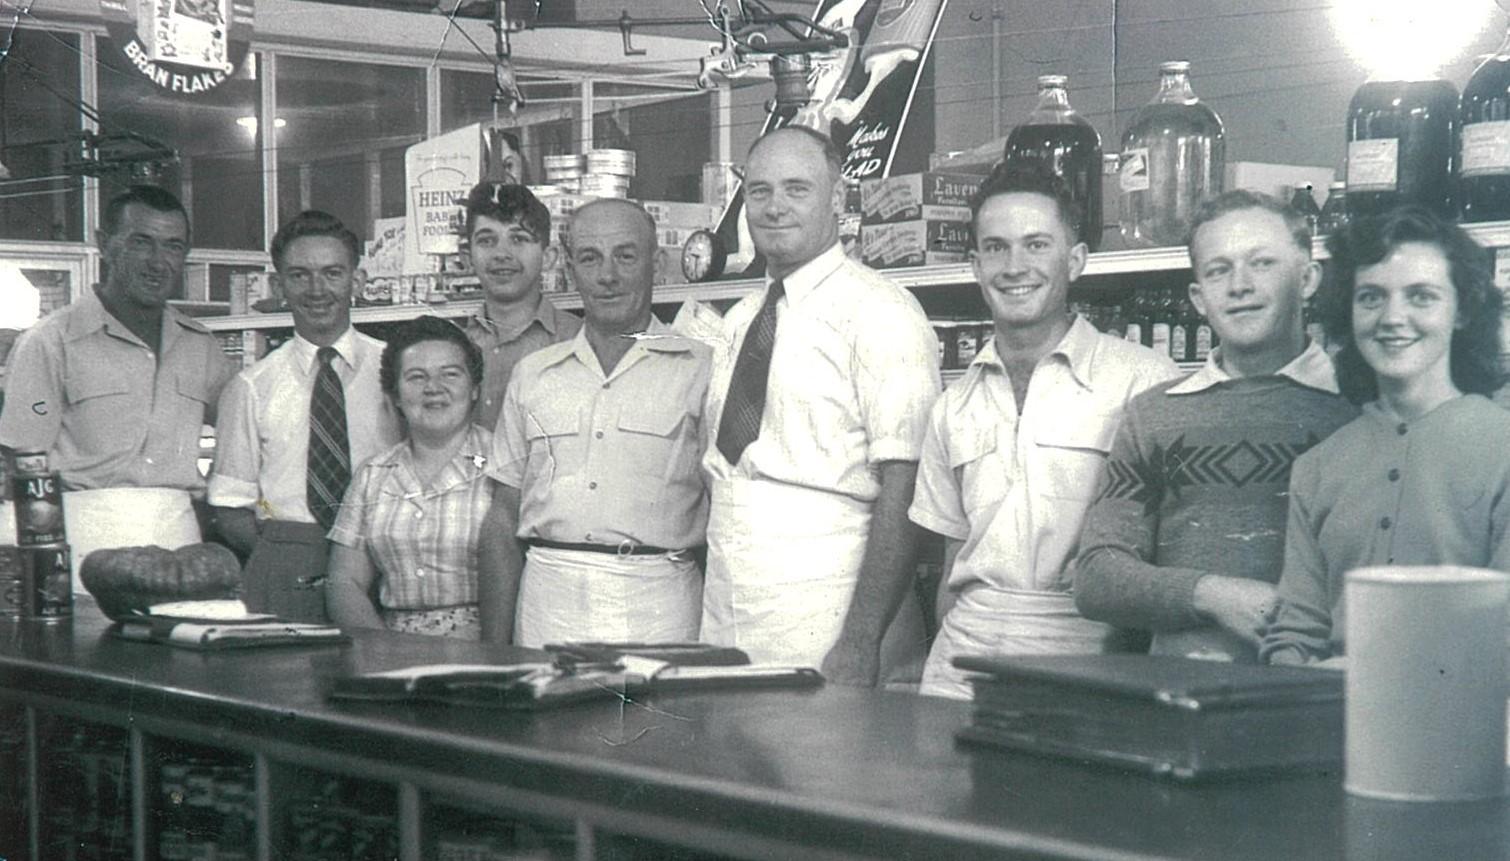 Foxe's staff, approximately 1950-51: Ray Eather, Dennis Smith, Pat Hedley, John Bridges, Byron Jones, Jack Cherry, Noel Alexander (Boyce'sbrother) Ron McNamara and Margaret Eather.